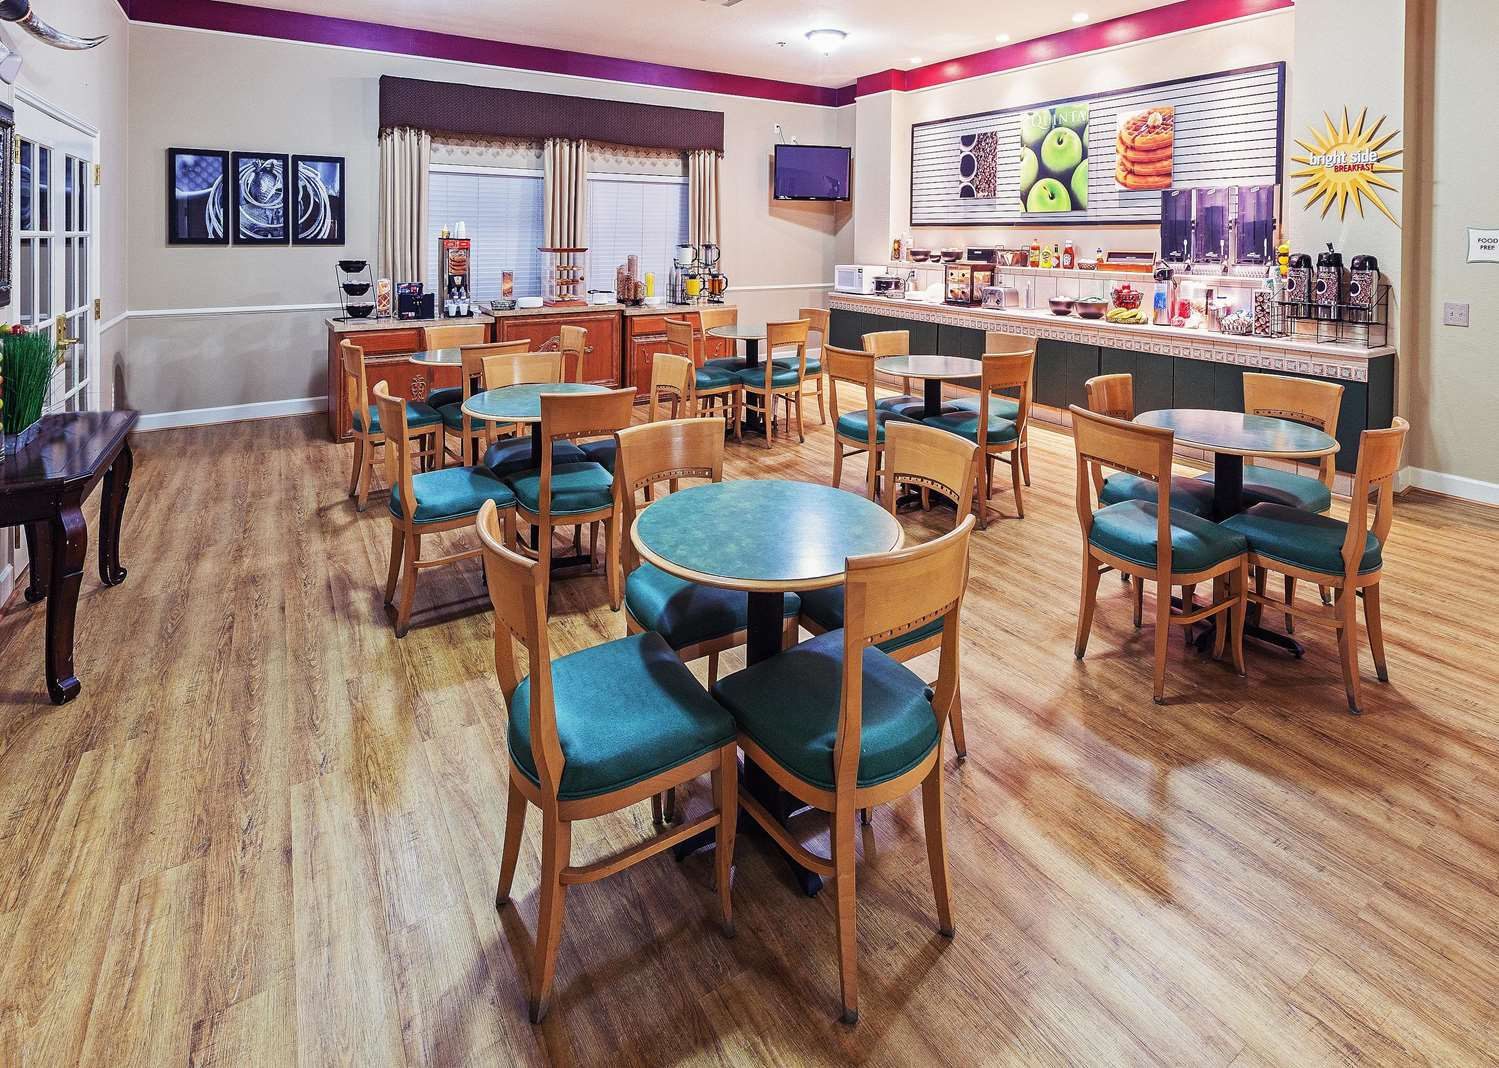 proam - La Quinta Inn & Suites Weatherford